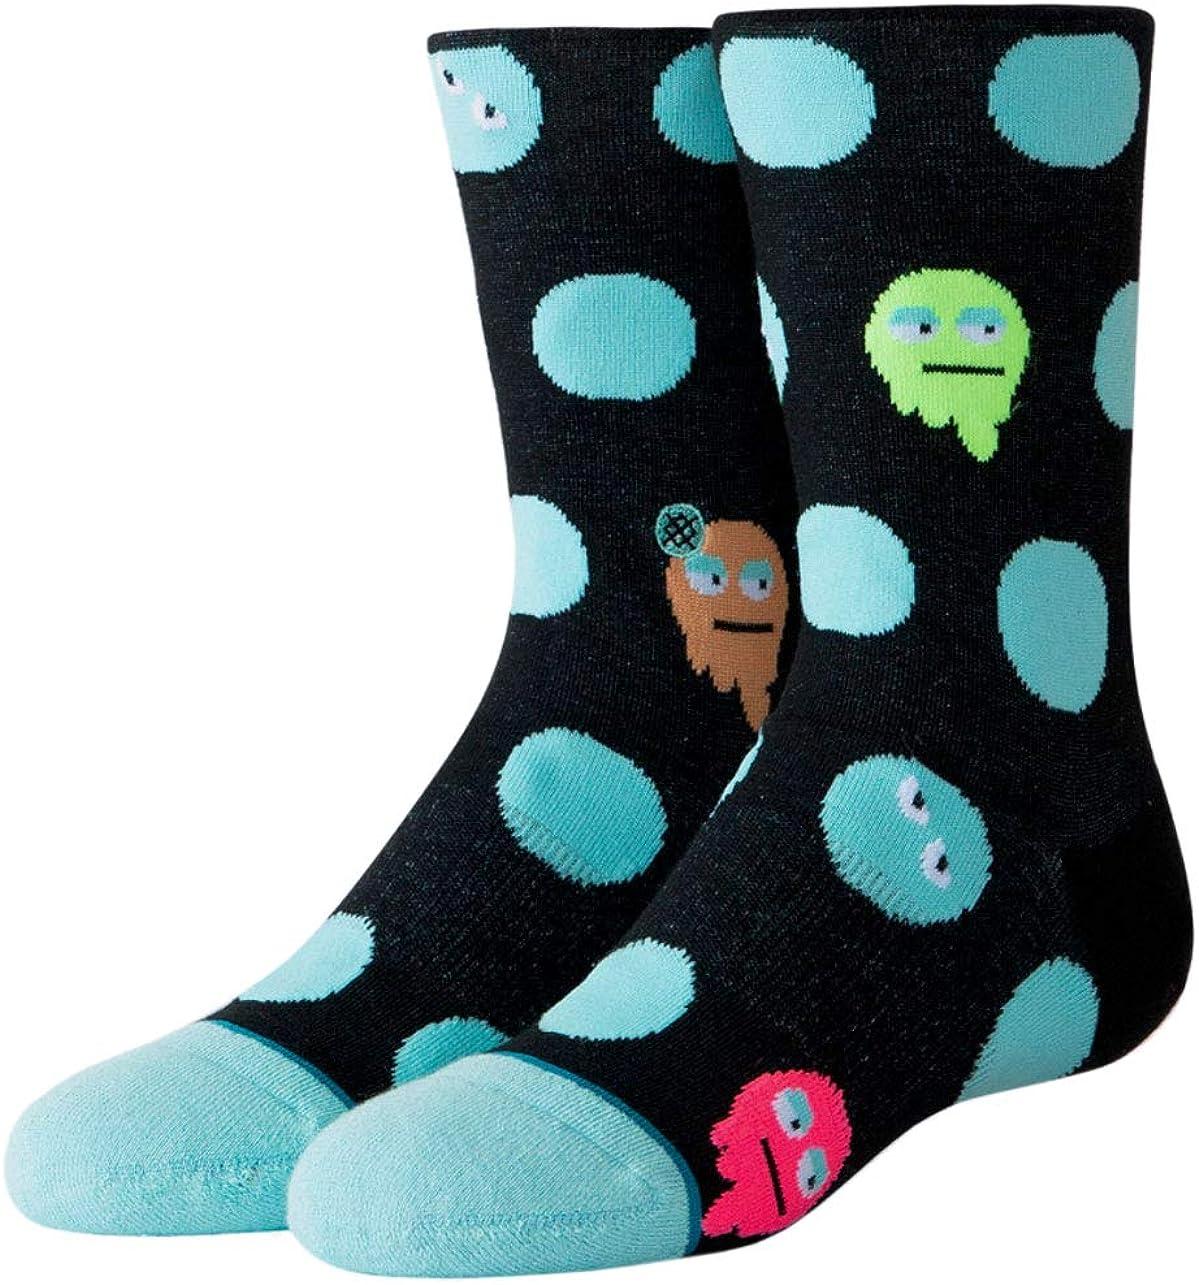 Stance Kids Youth Crew Socks-Boys//Girls